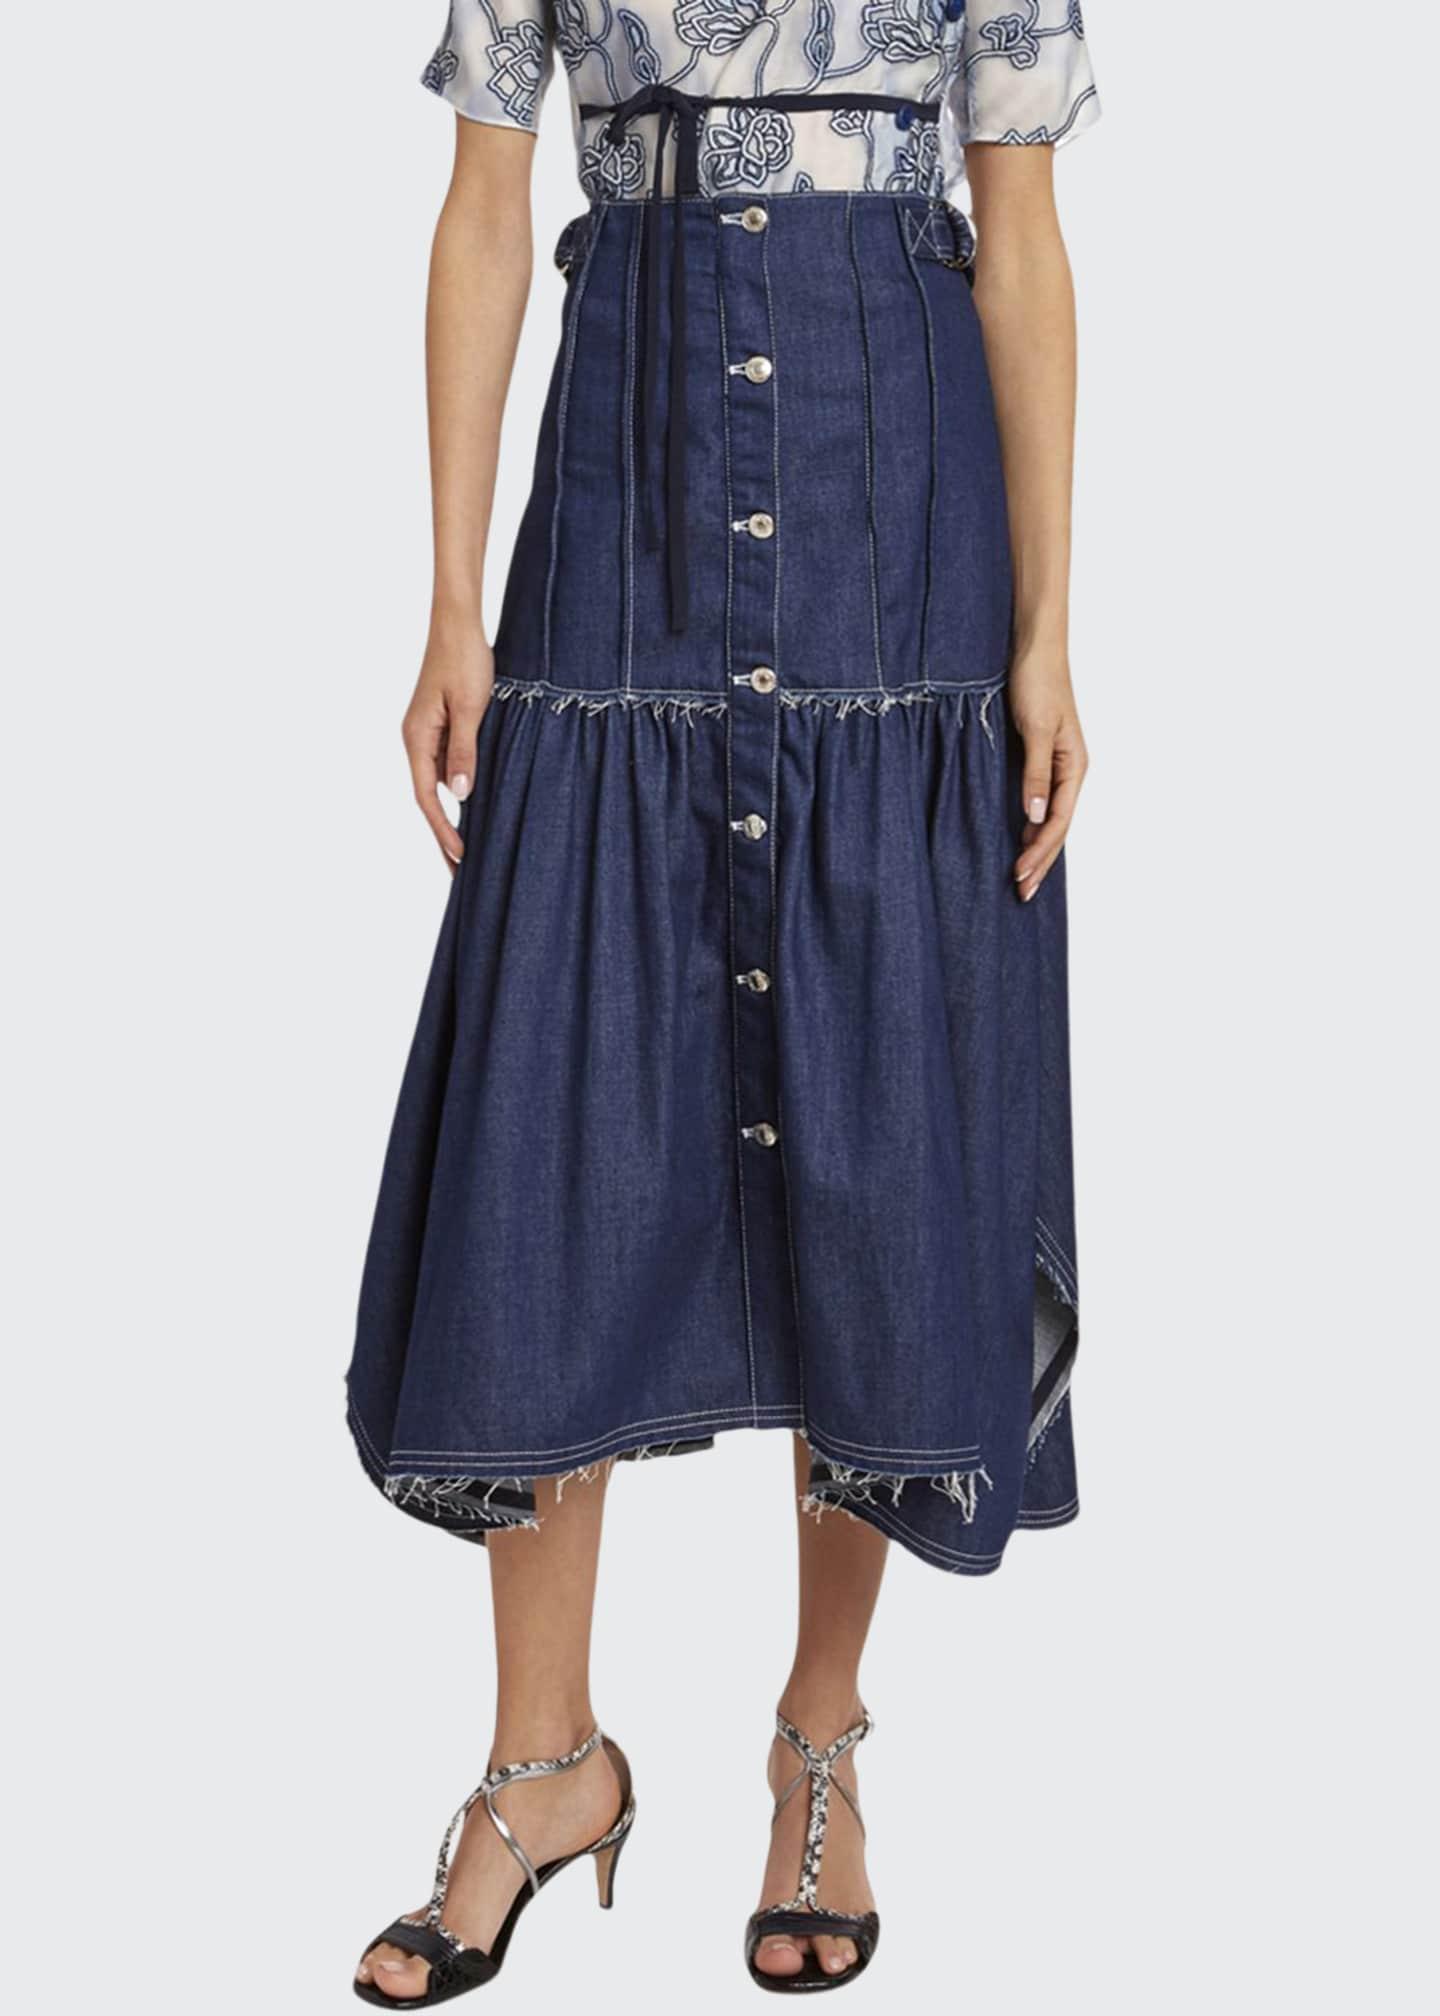 Chloe Distressed Denim Midi Skirt